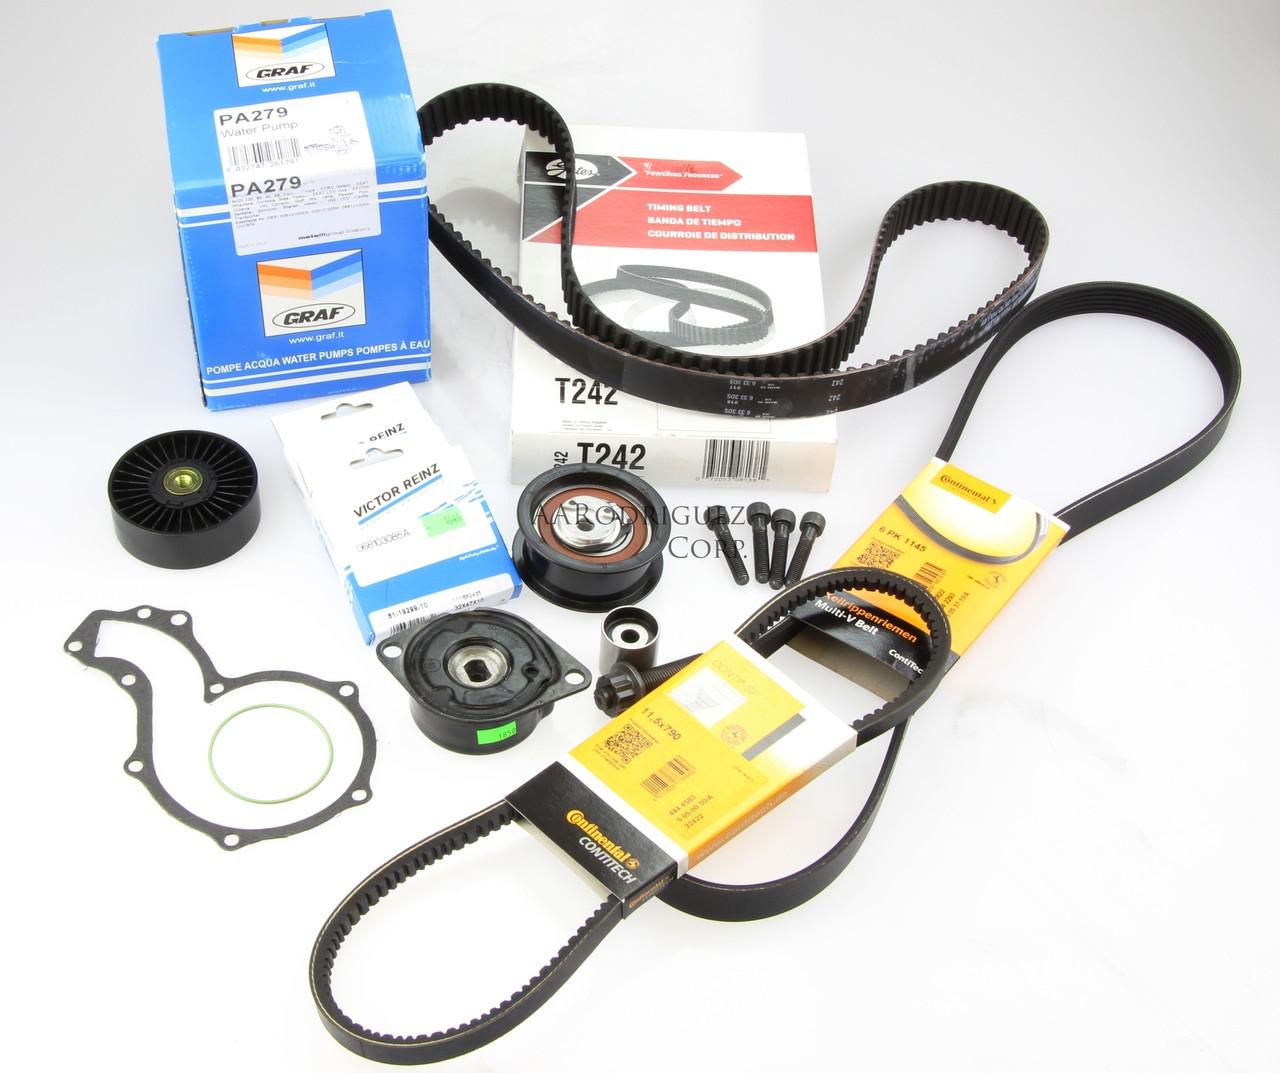 MK3 & B4 Deluxe Timing Belt Kit '96-98 TDI -  1Z AHU TDI 60k Rating (AAR1458)